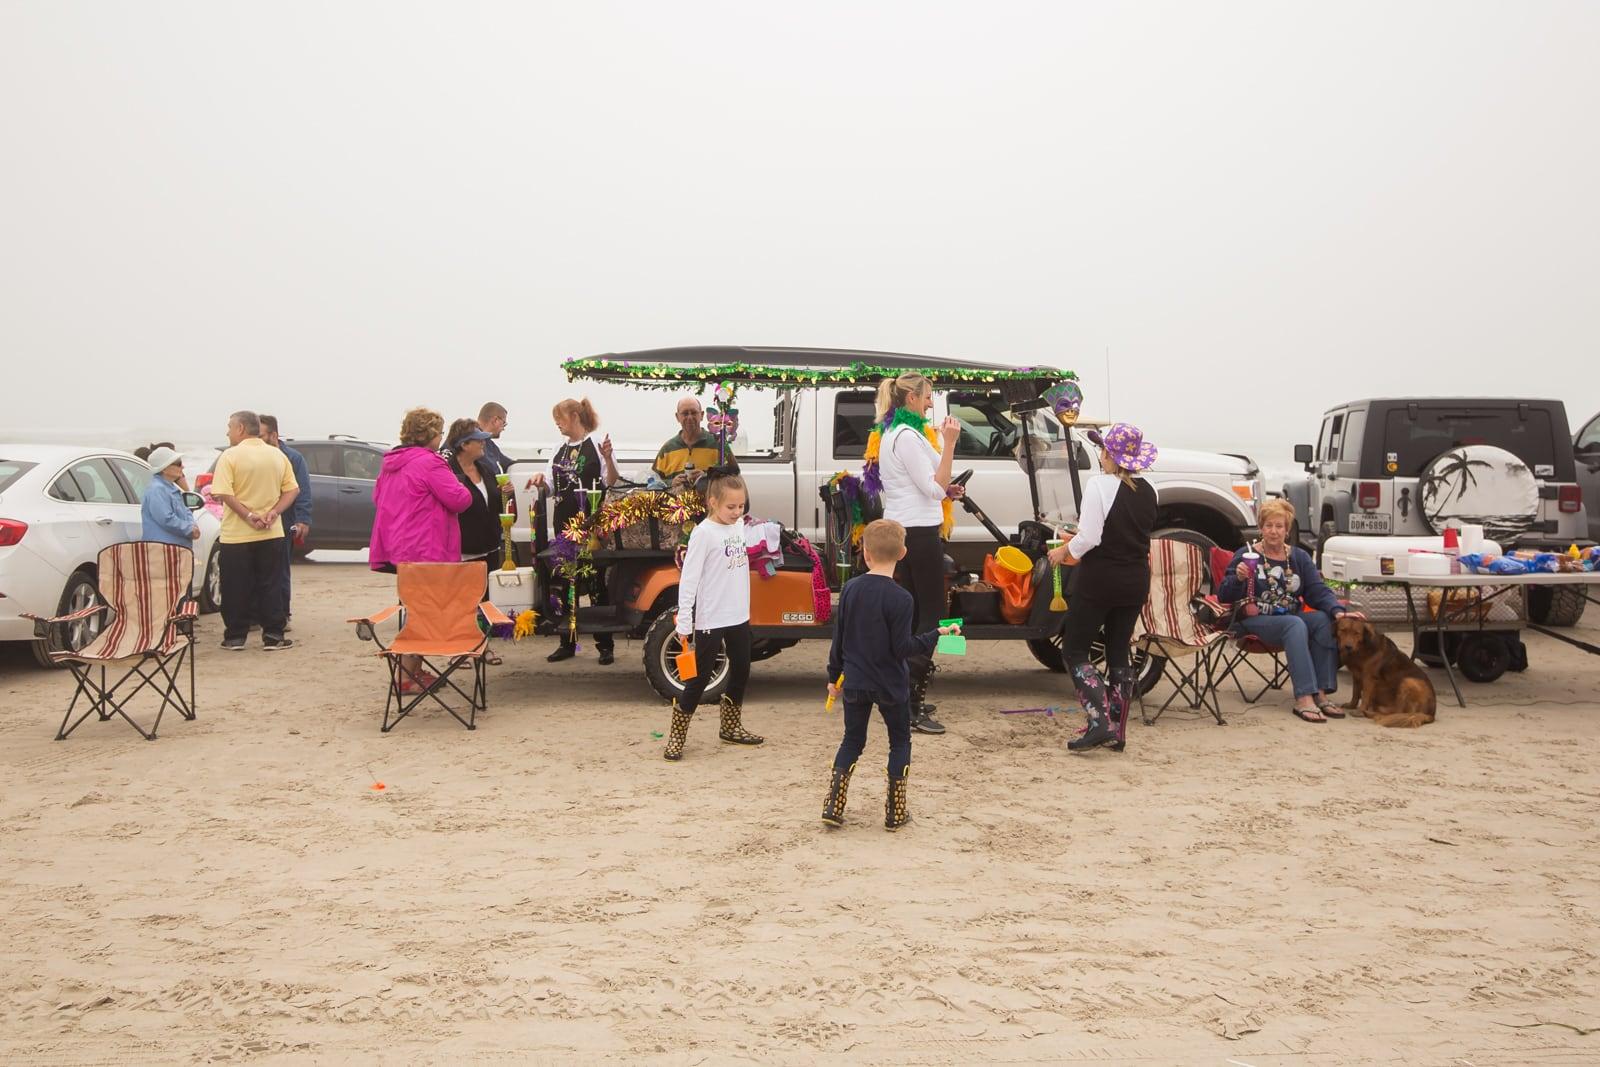 Whitecap Beach parade